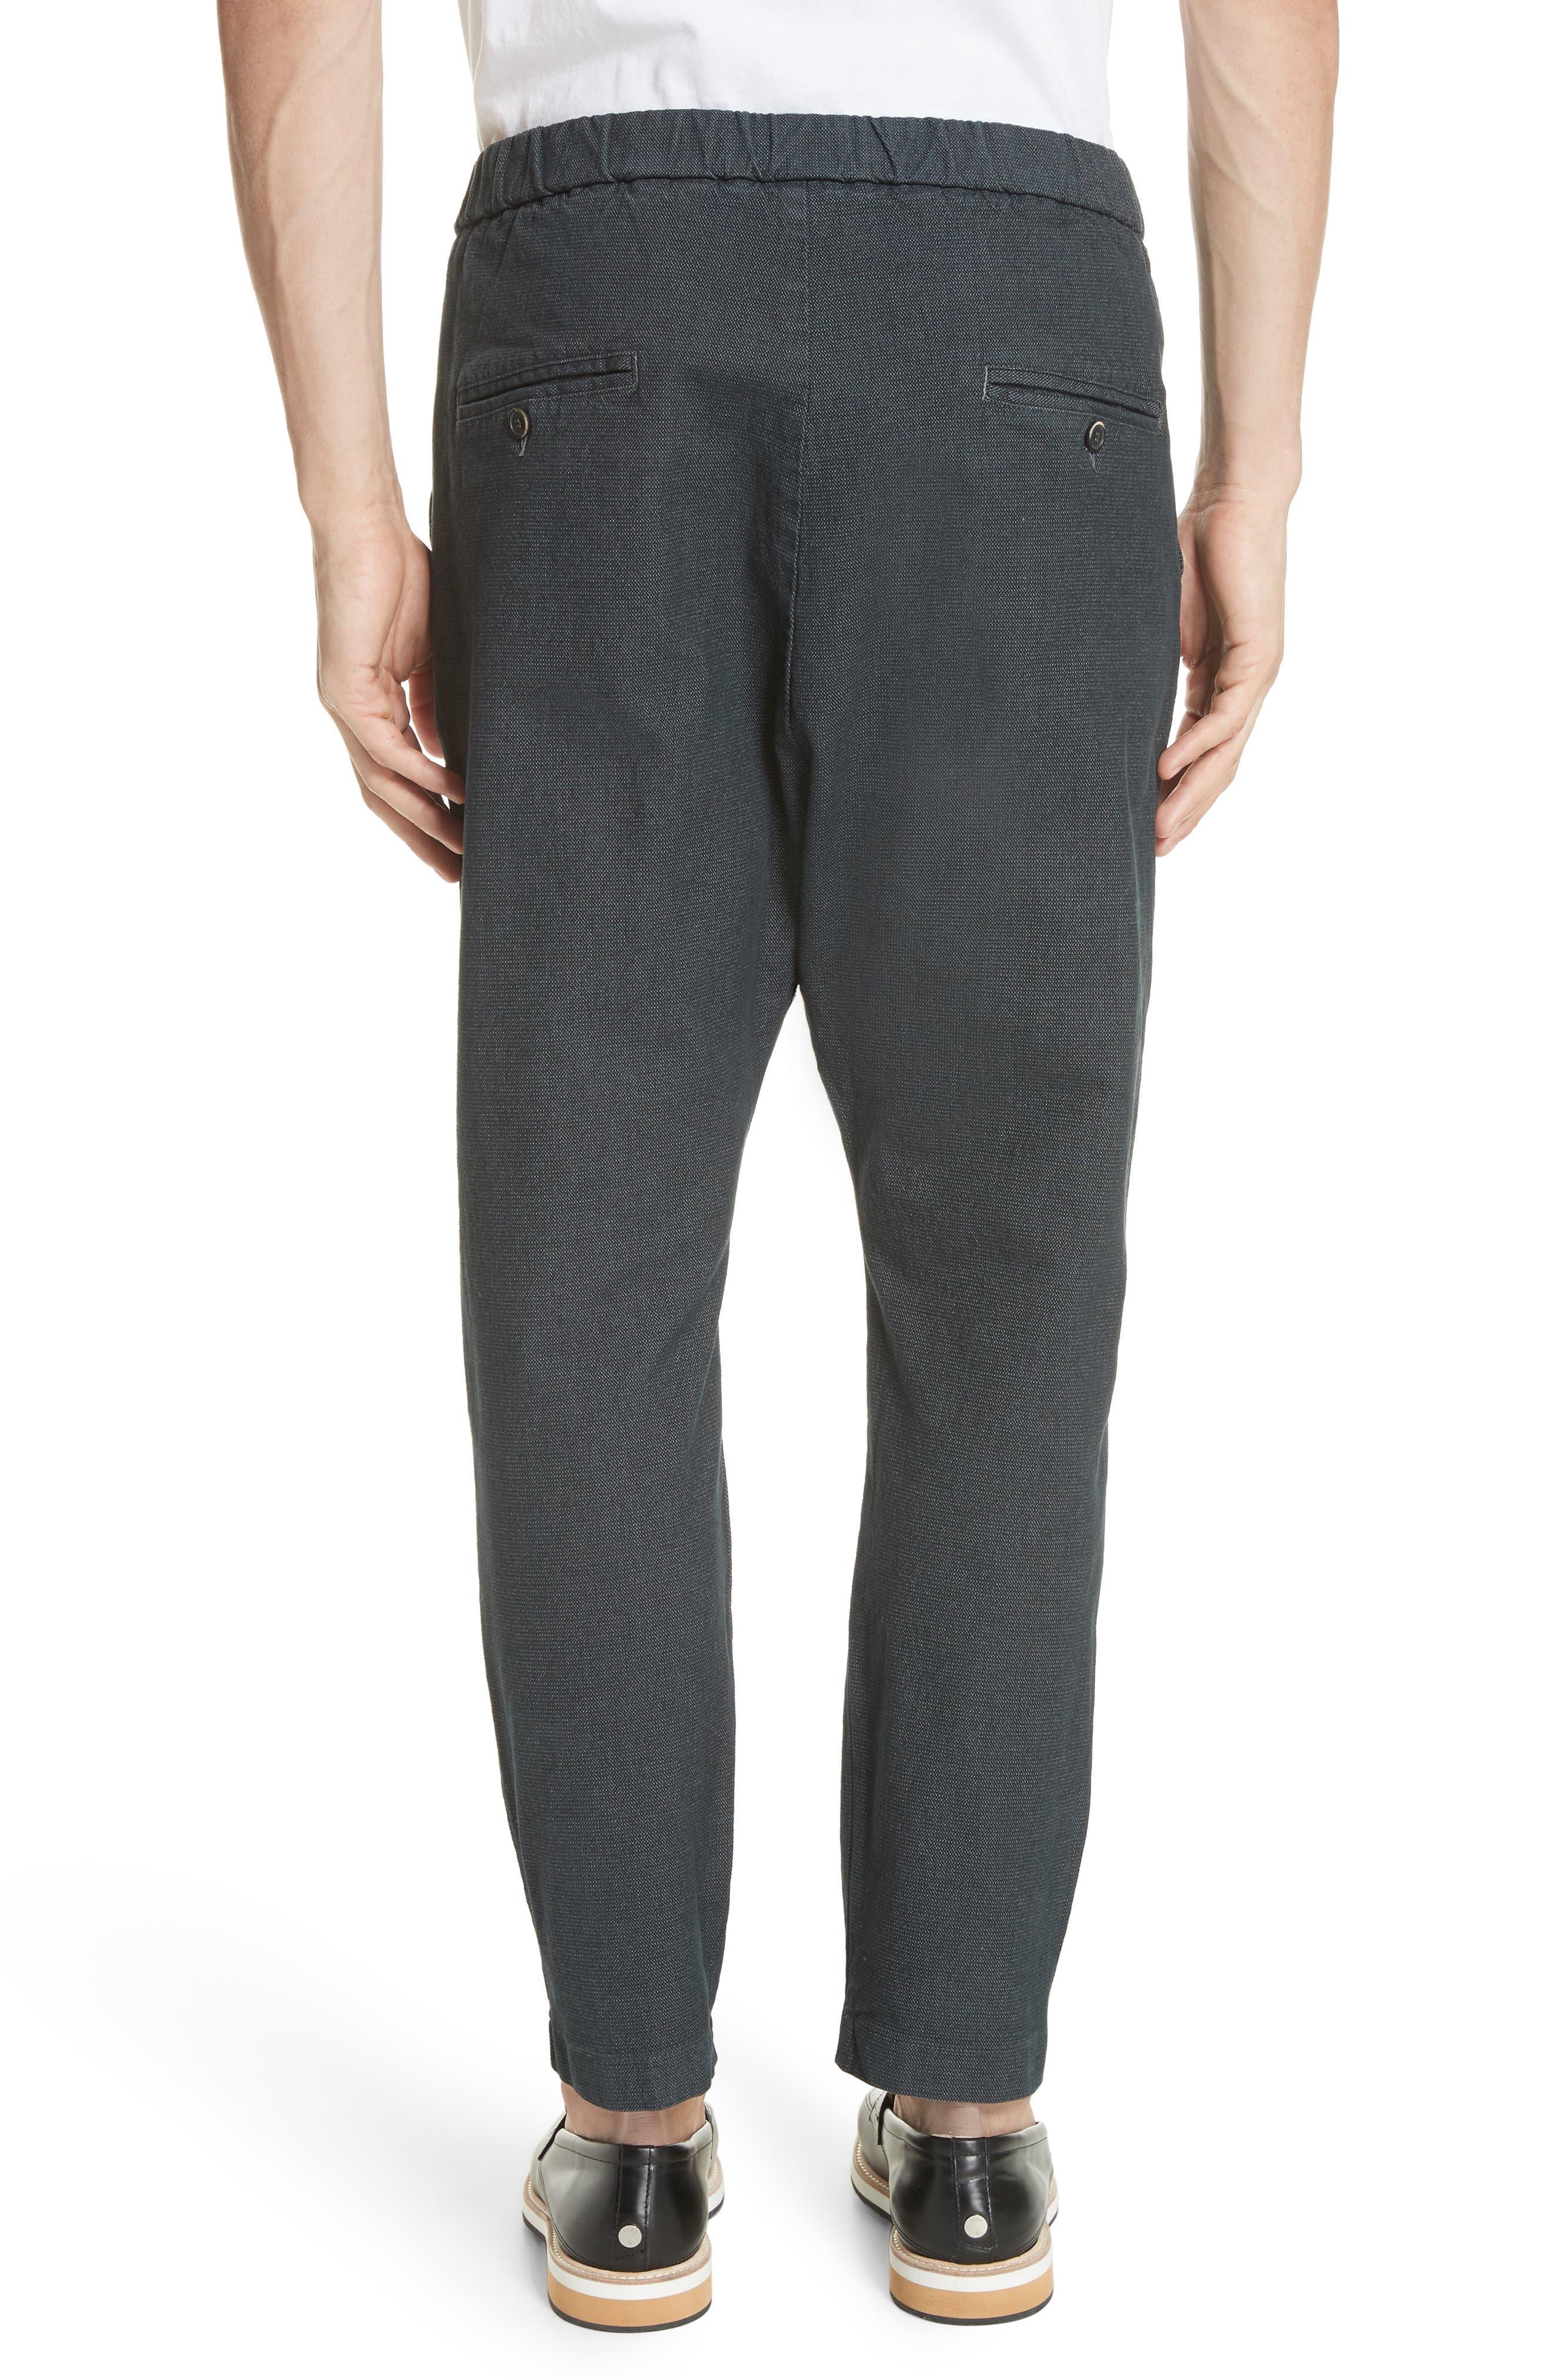 Aregna Ponto Trousers,                             Alternate thumbnail 2, color,                             020